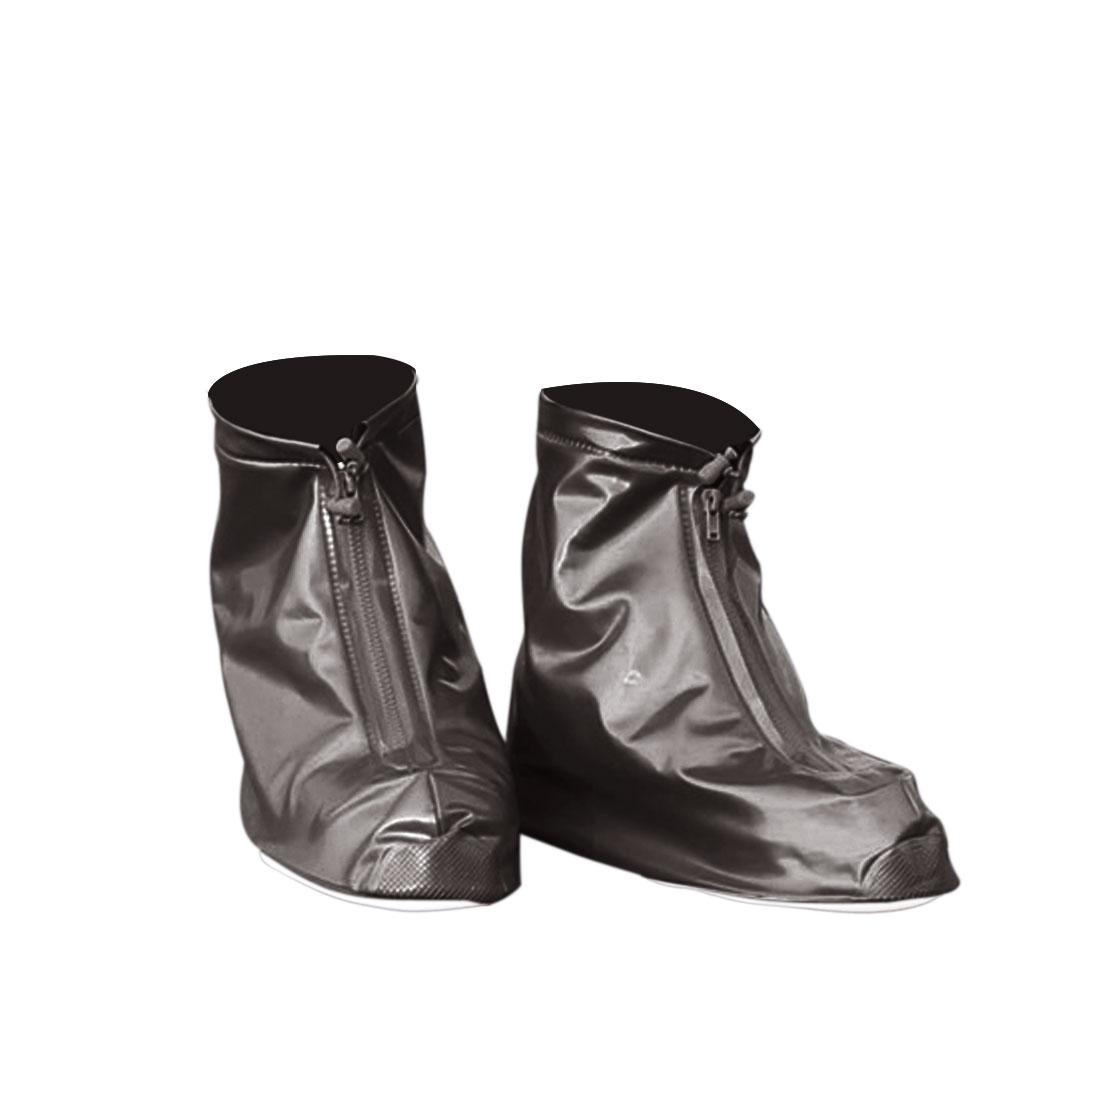 1 Pair Coffee Color Size XL Unisex PVC Nonslip Reusable Waterproof Rain Shoes Cover Guard Overshoes